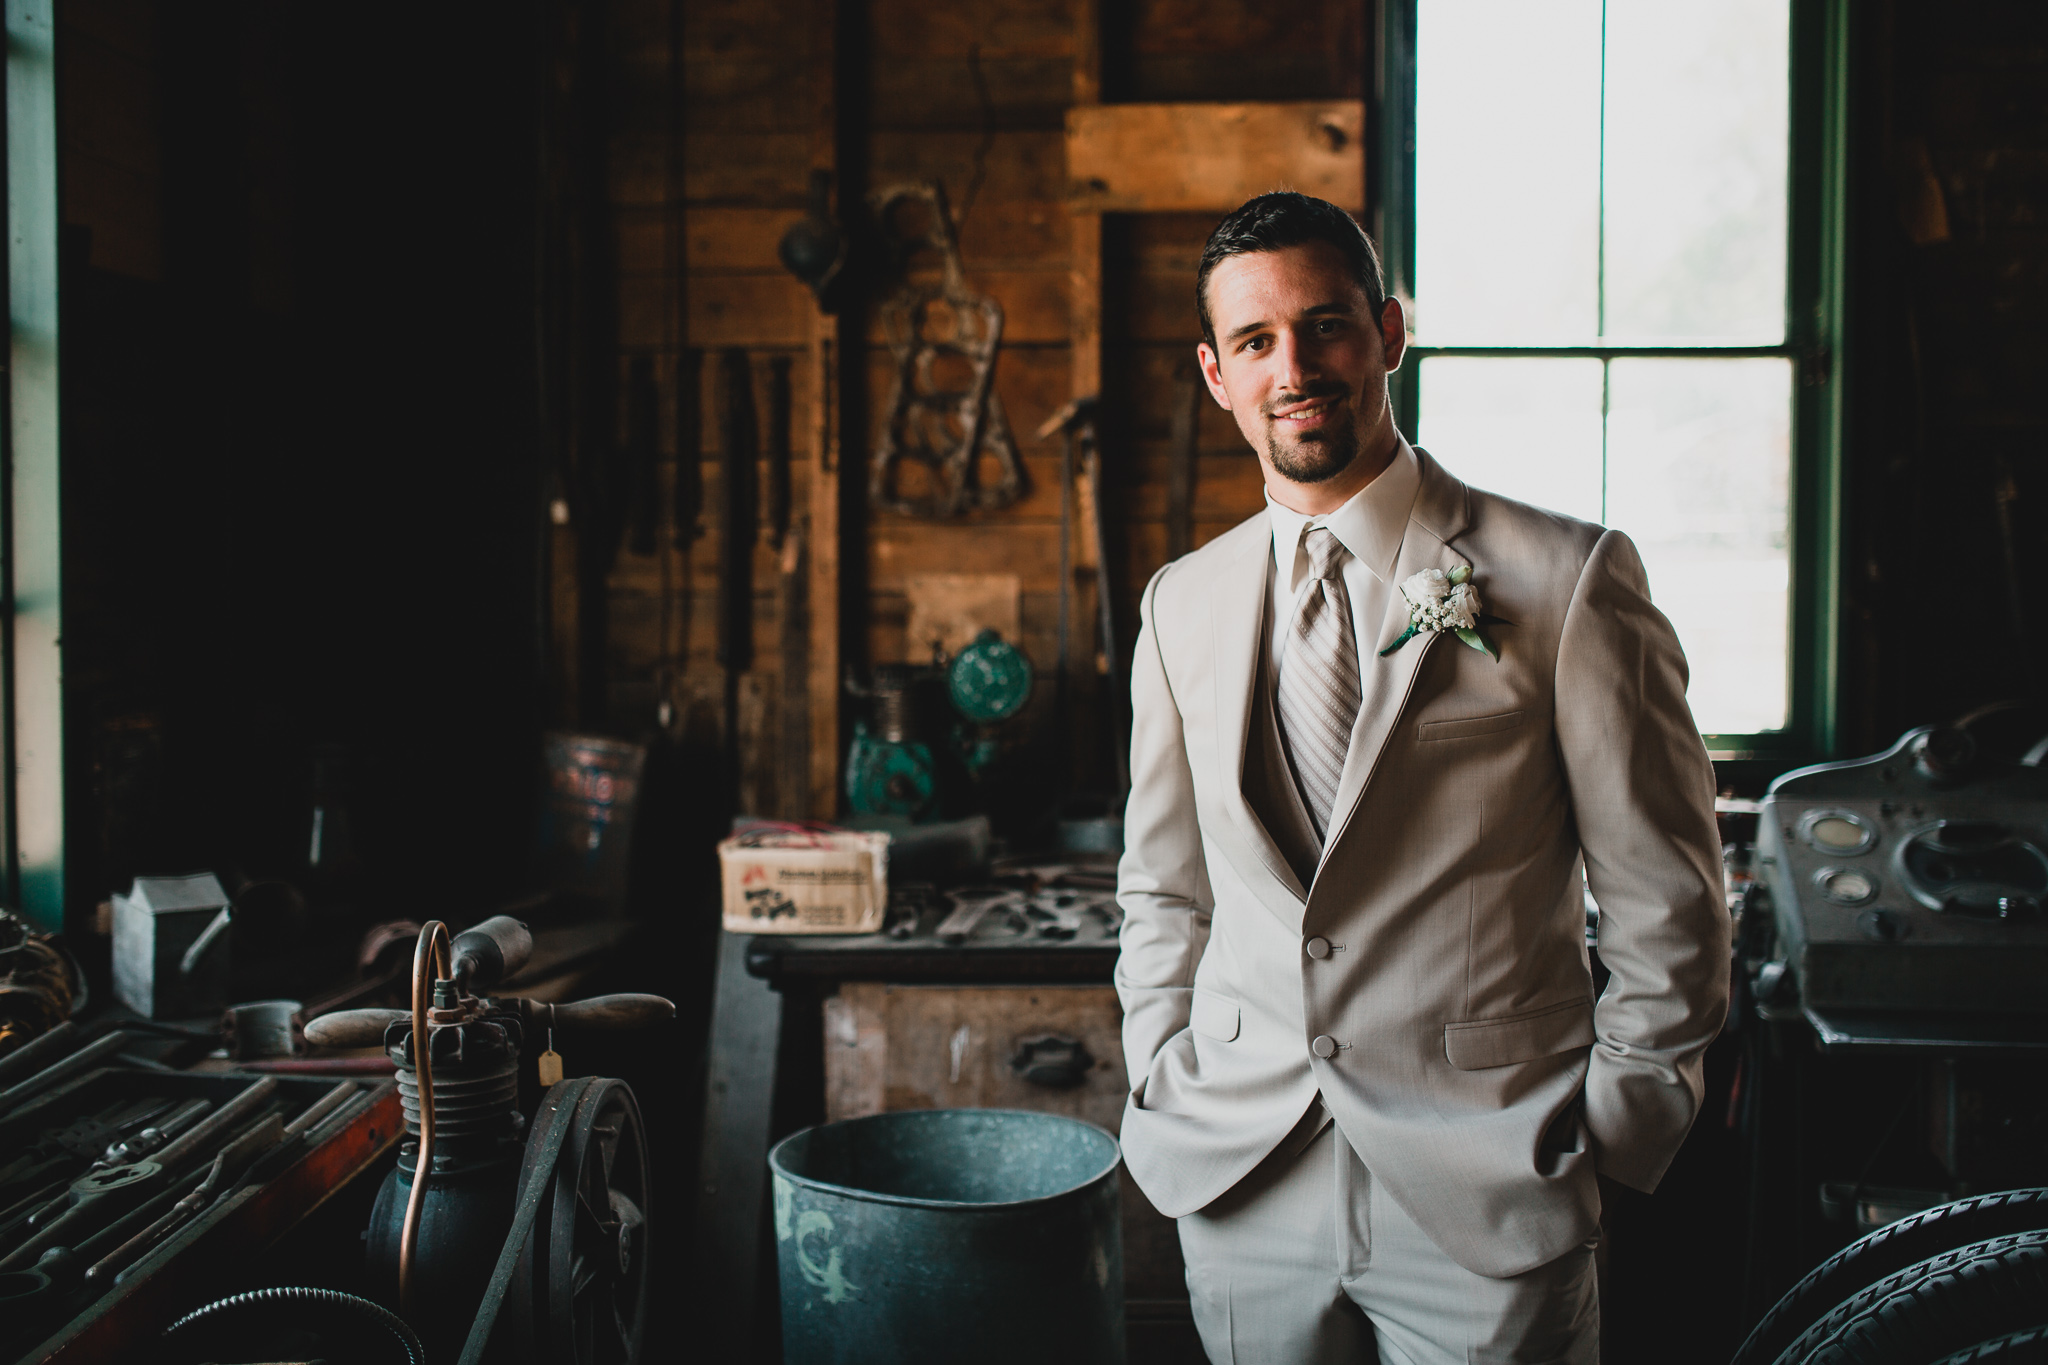 Cumberland Museum Wedding Venue